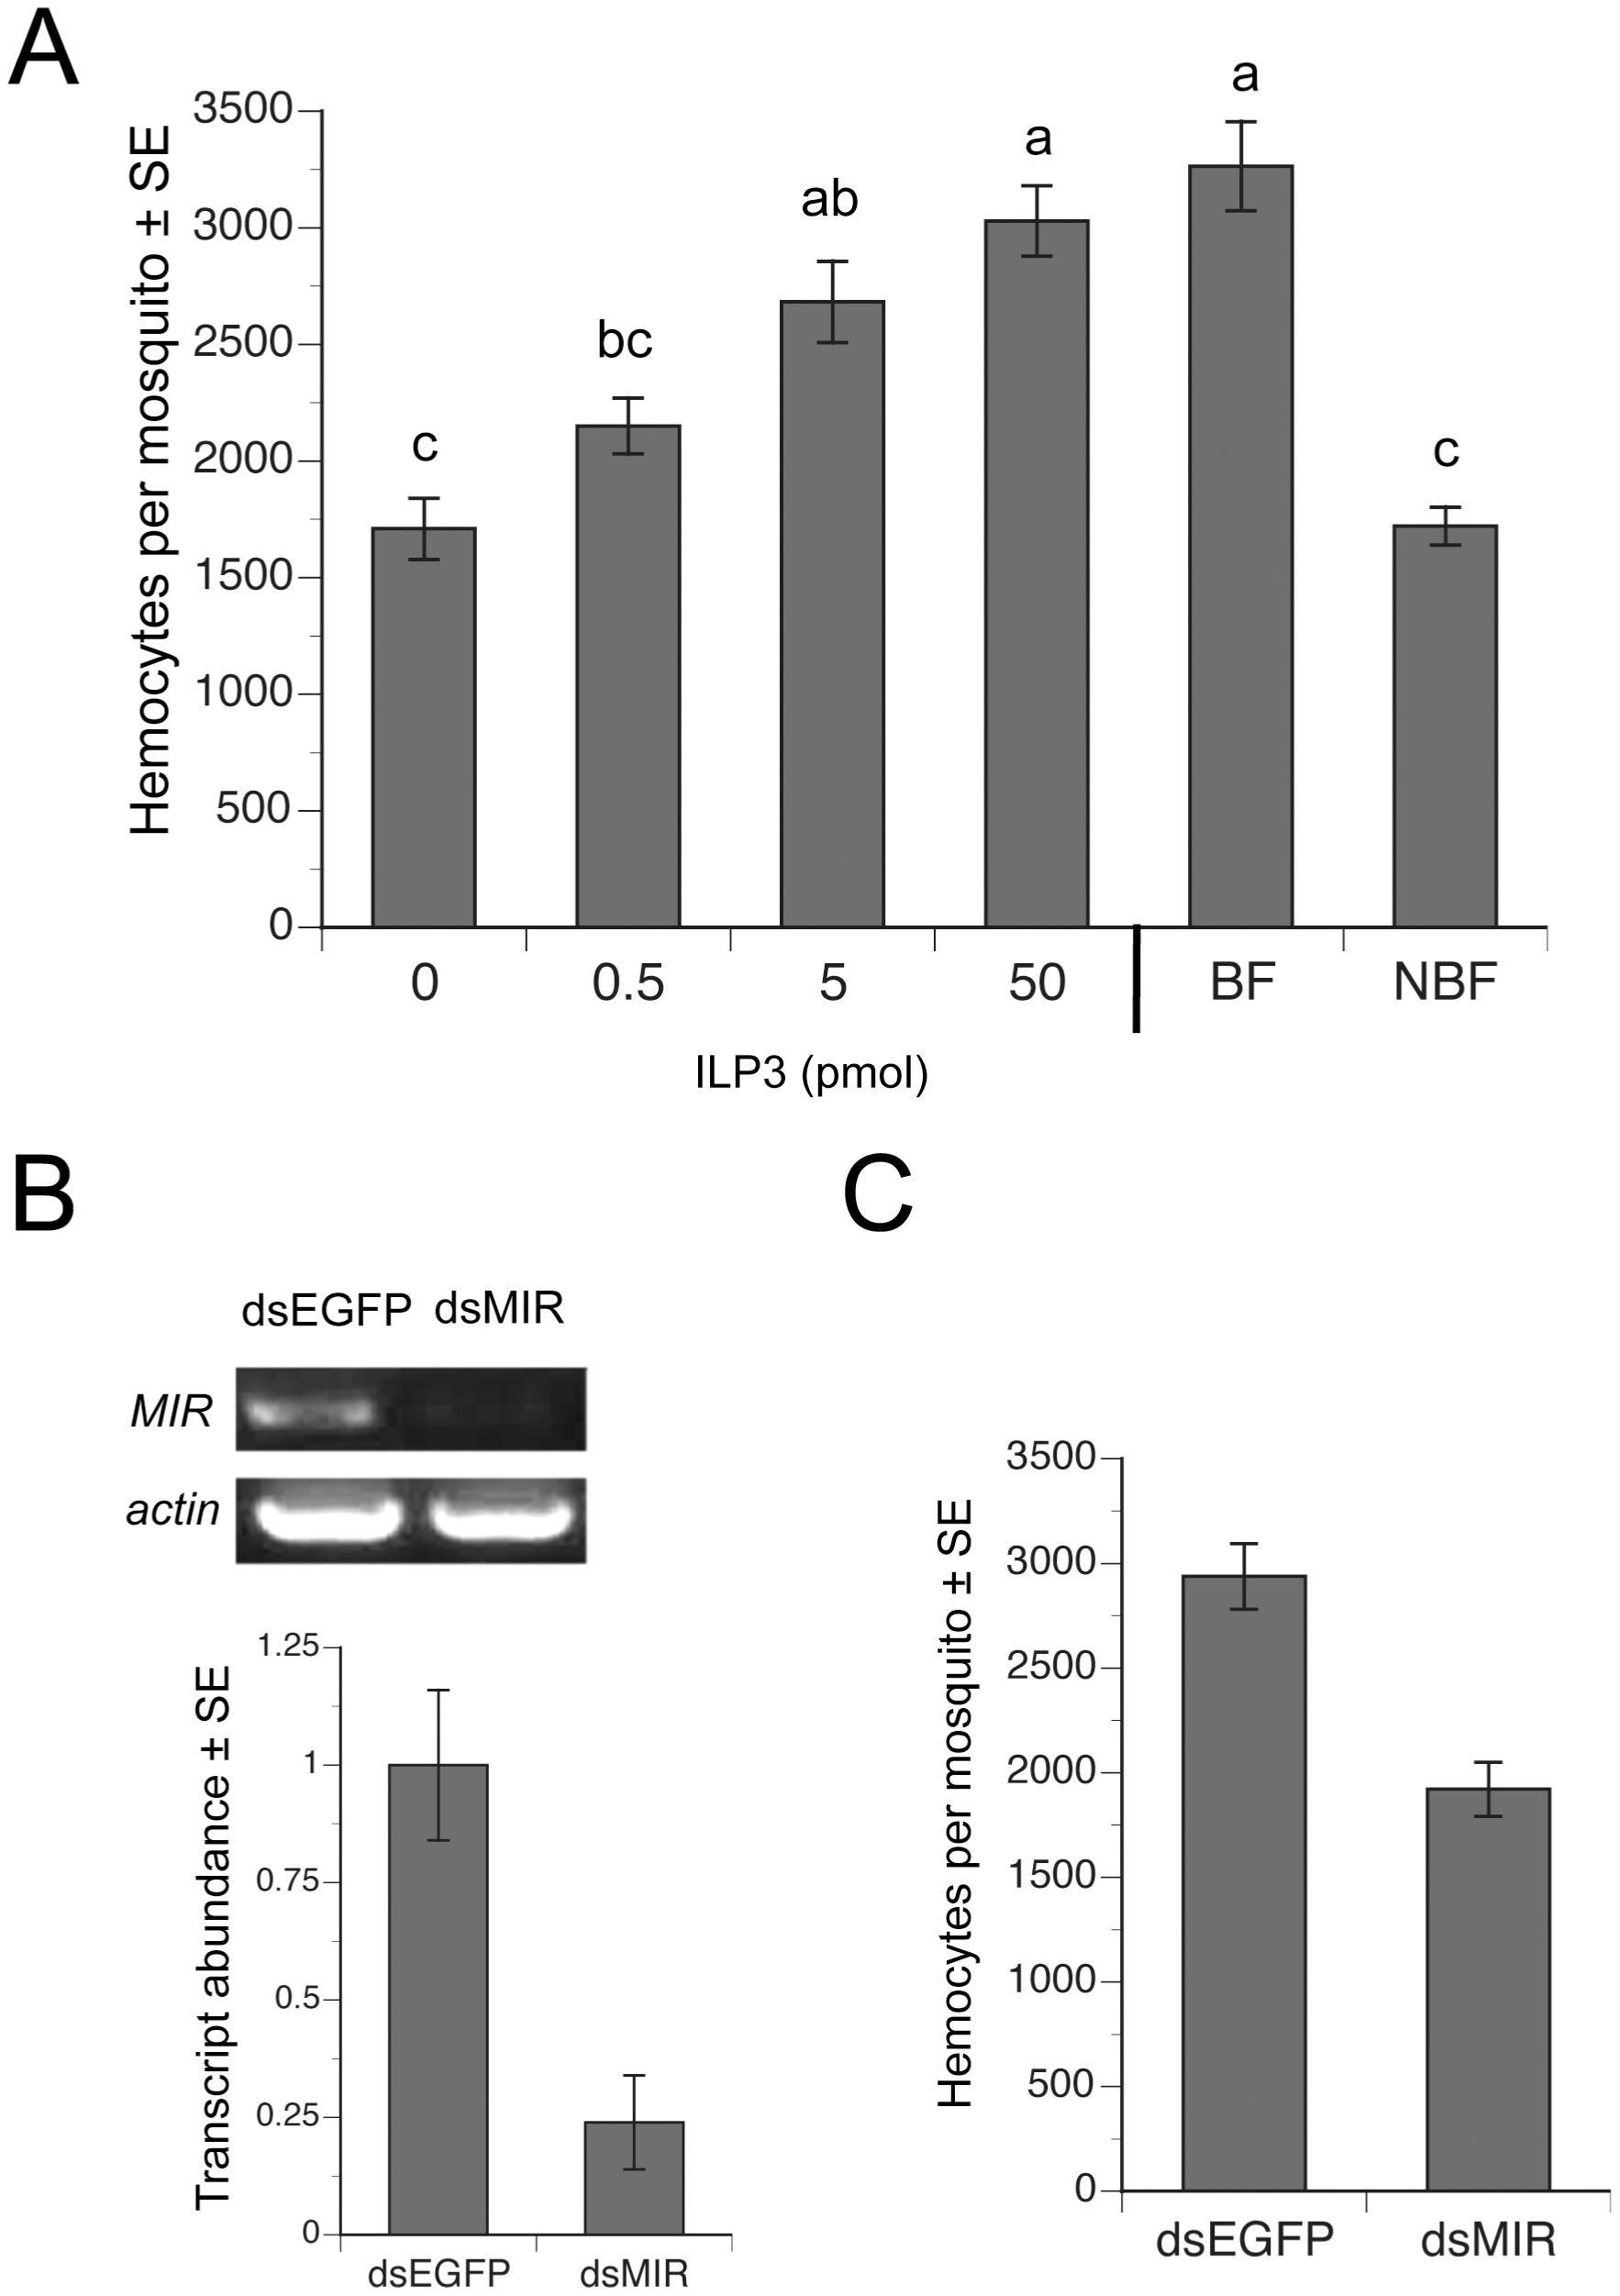 ILP3 dose-dependently rescues hemocyte abundance after decapitation while dsMIR treatment reduces hemocyte abundance.